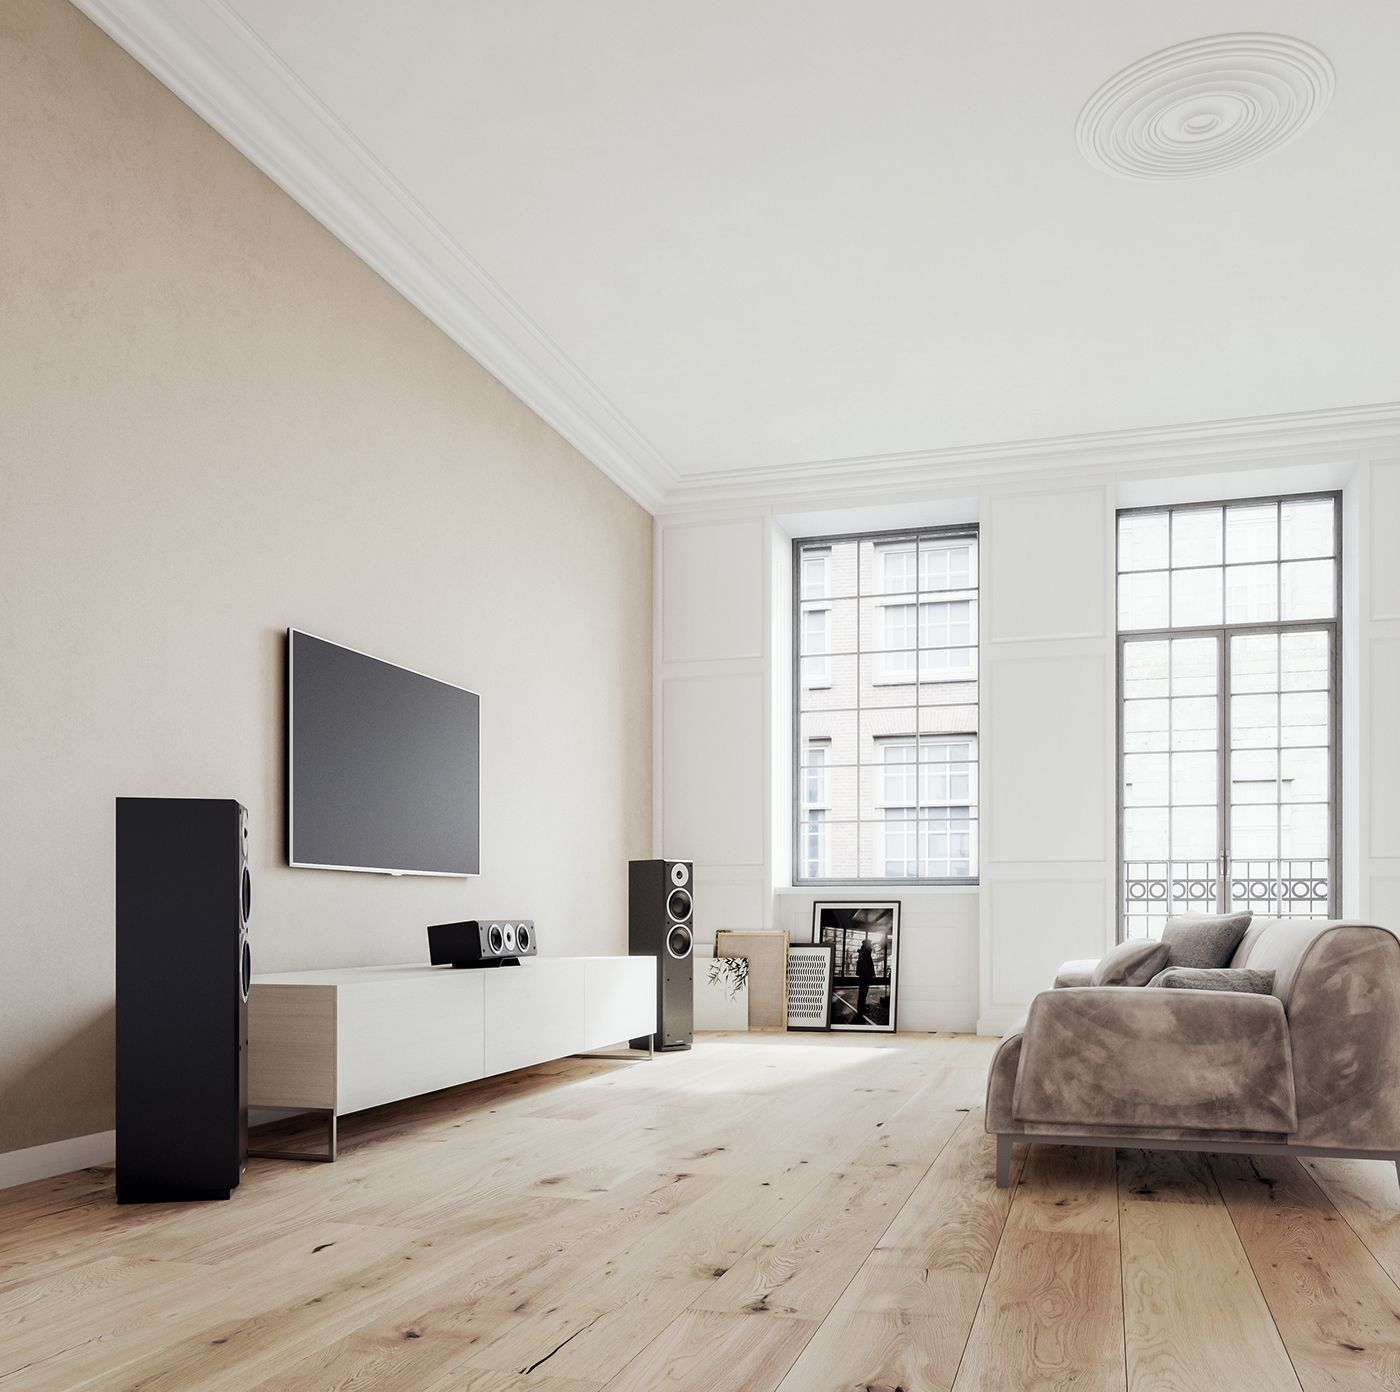 Dynaudio - Emit series Hi-Fi Speakers & Home Theatre on Behance ...